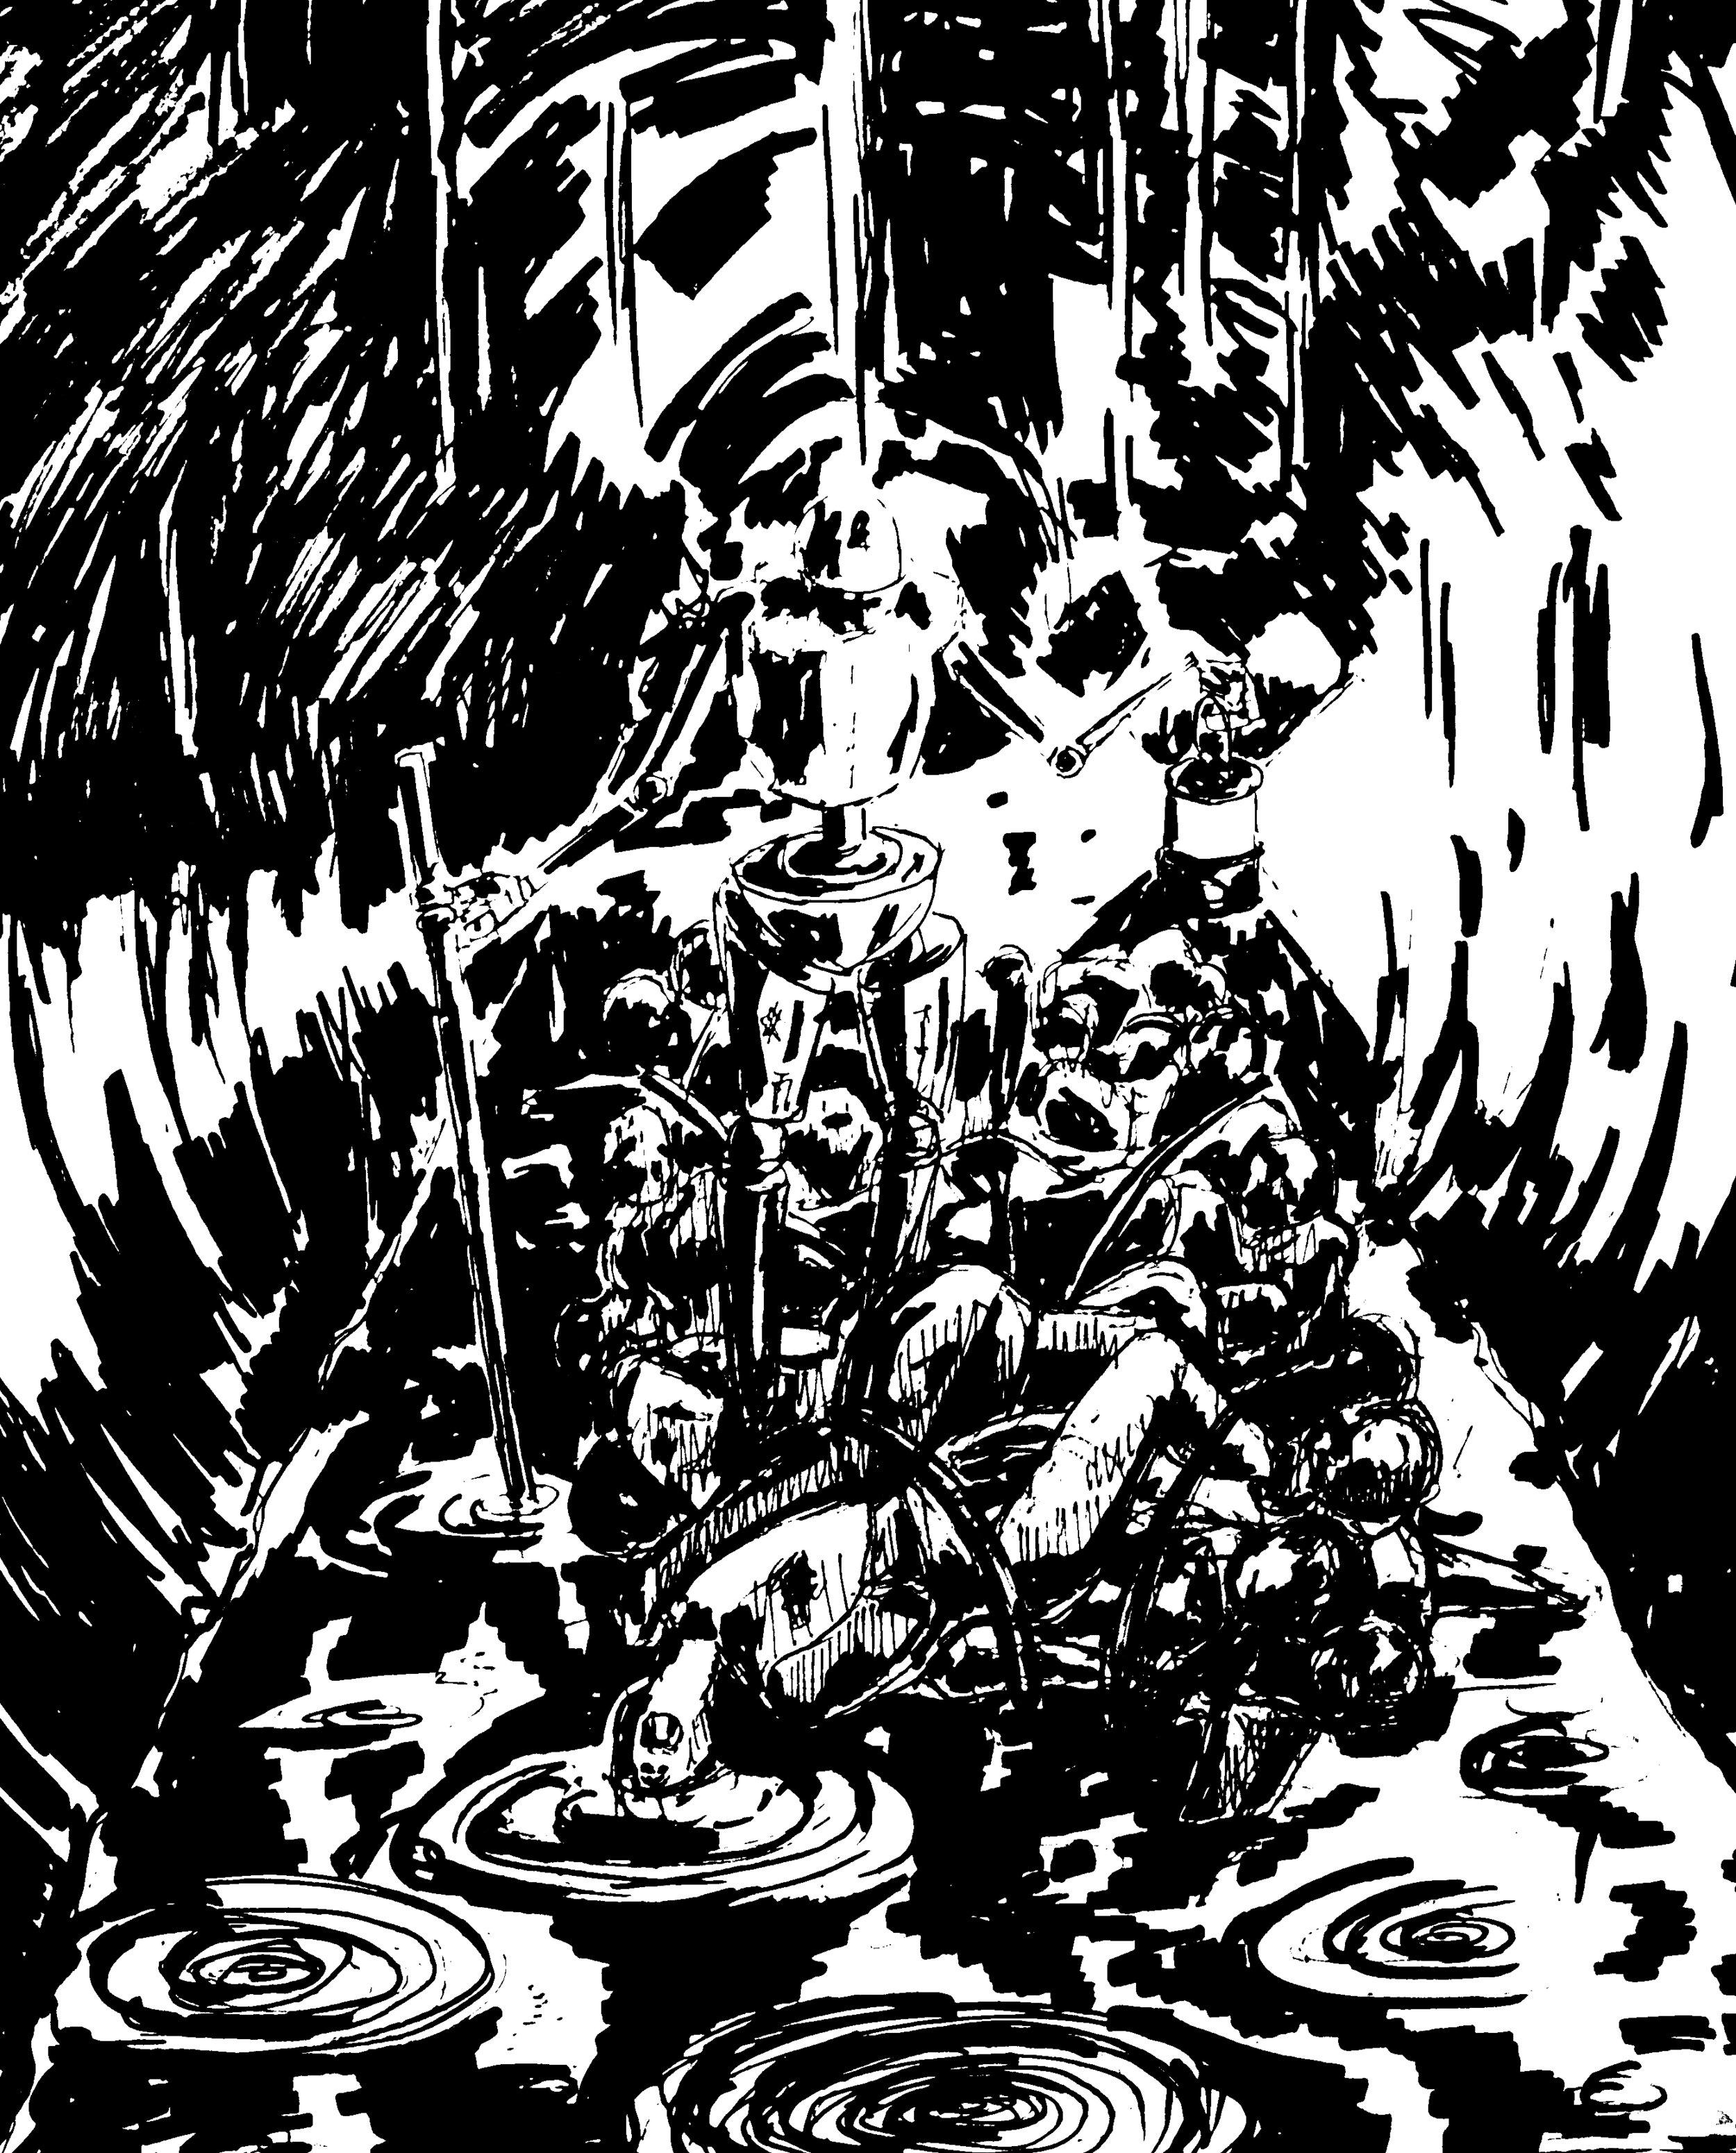 sewerbotillustraiton.jpg